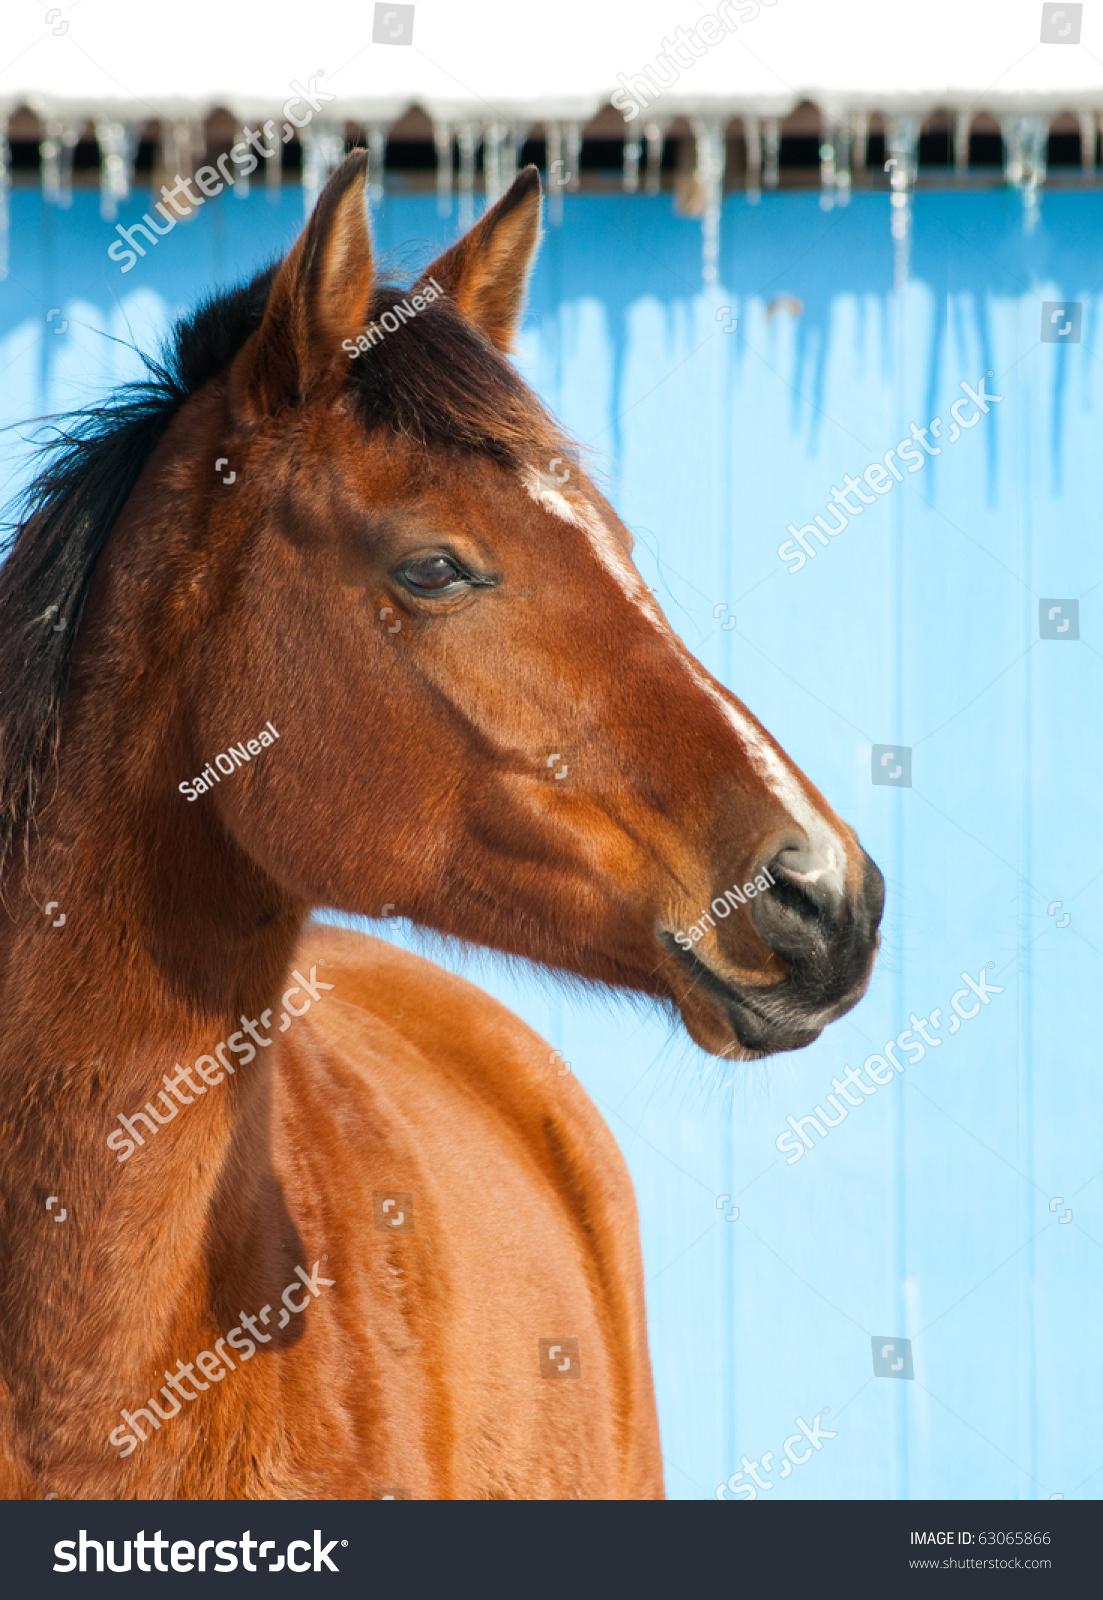 stock-photo-bay-horse-against-blue-barn-